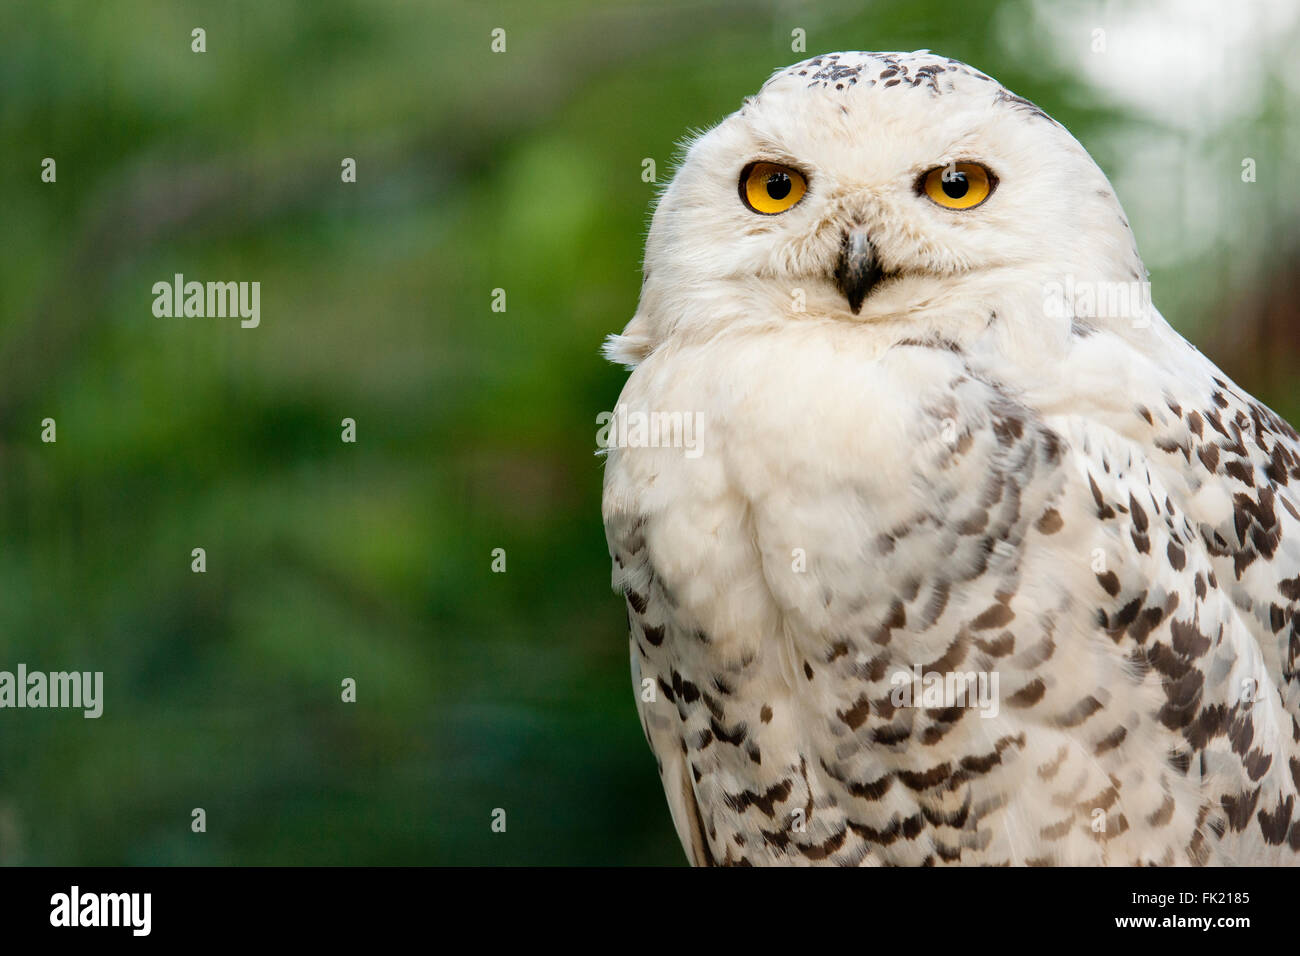 Snowy owl portrait - Stock Image